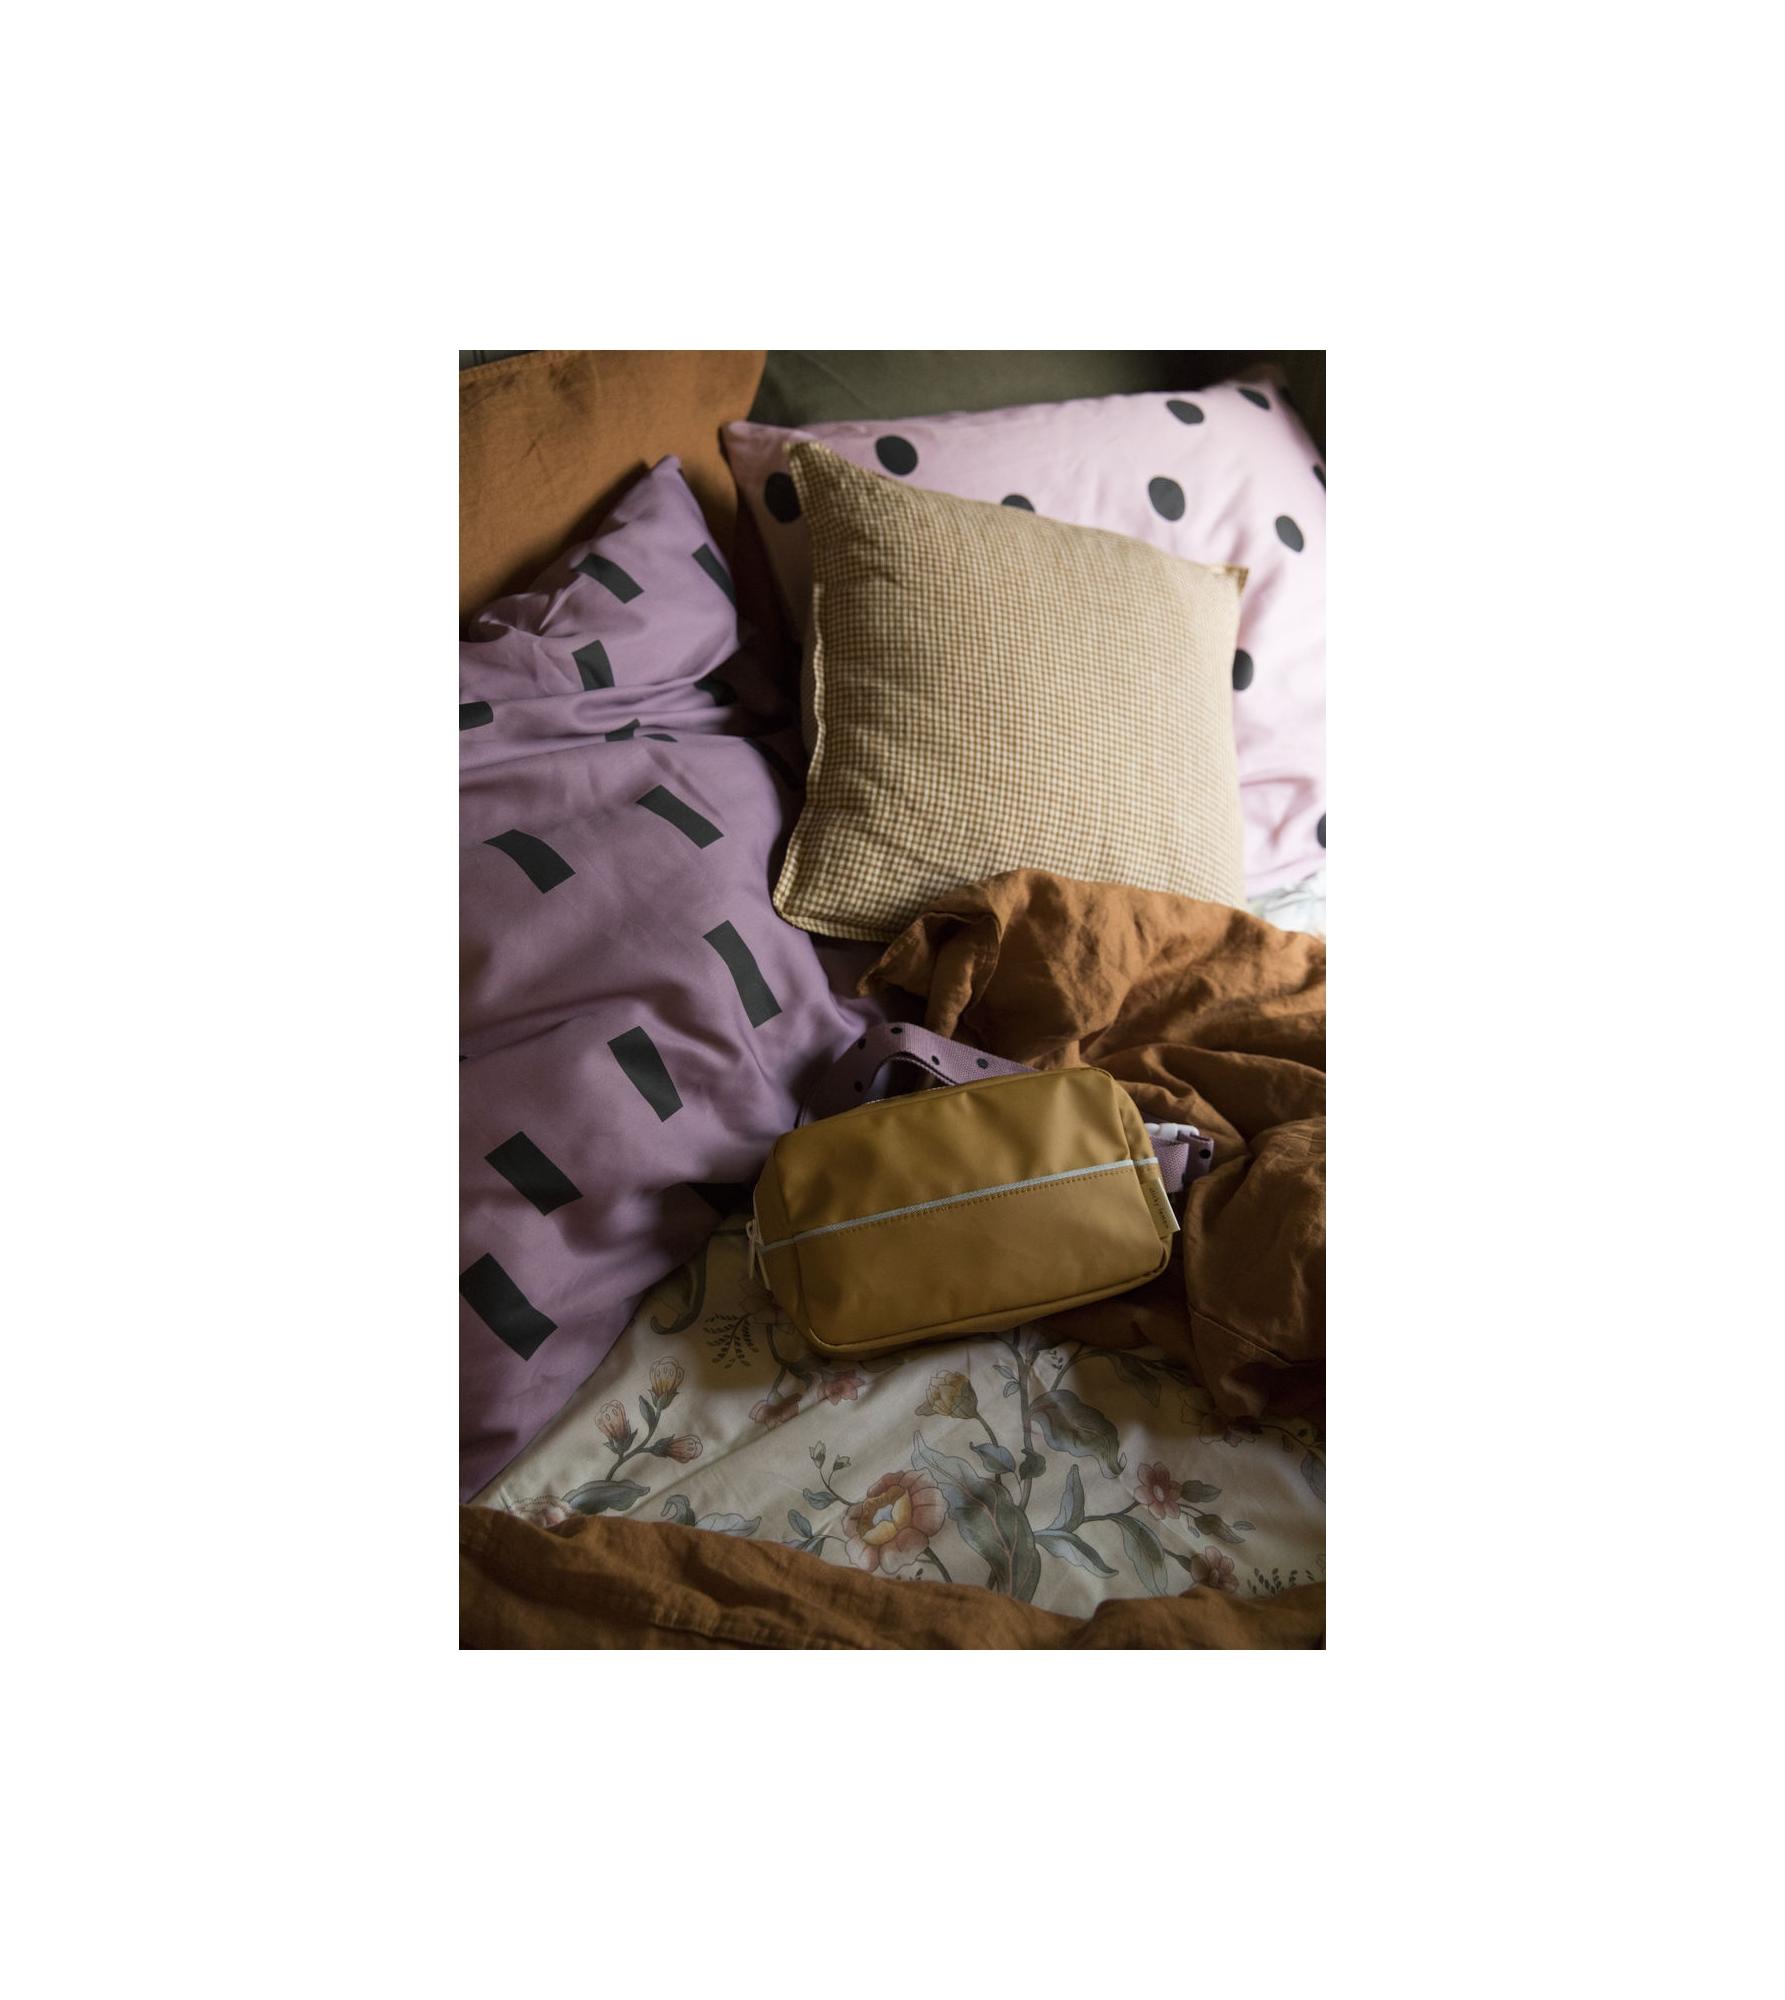 1801651 - Sticky Lemon - fanny pack large - freckles - caramel fudge + pirate purple - style sho (1).jpg